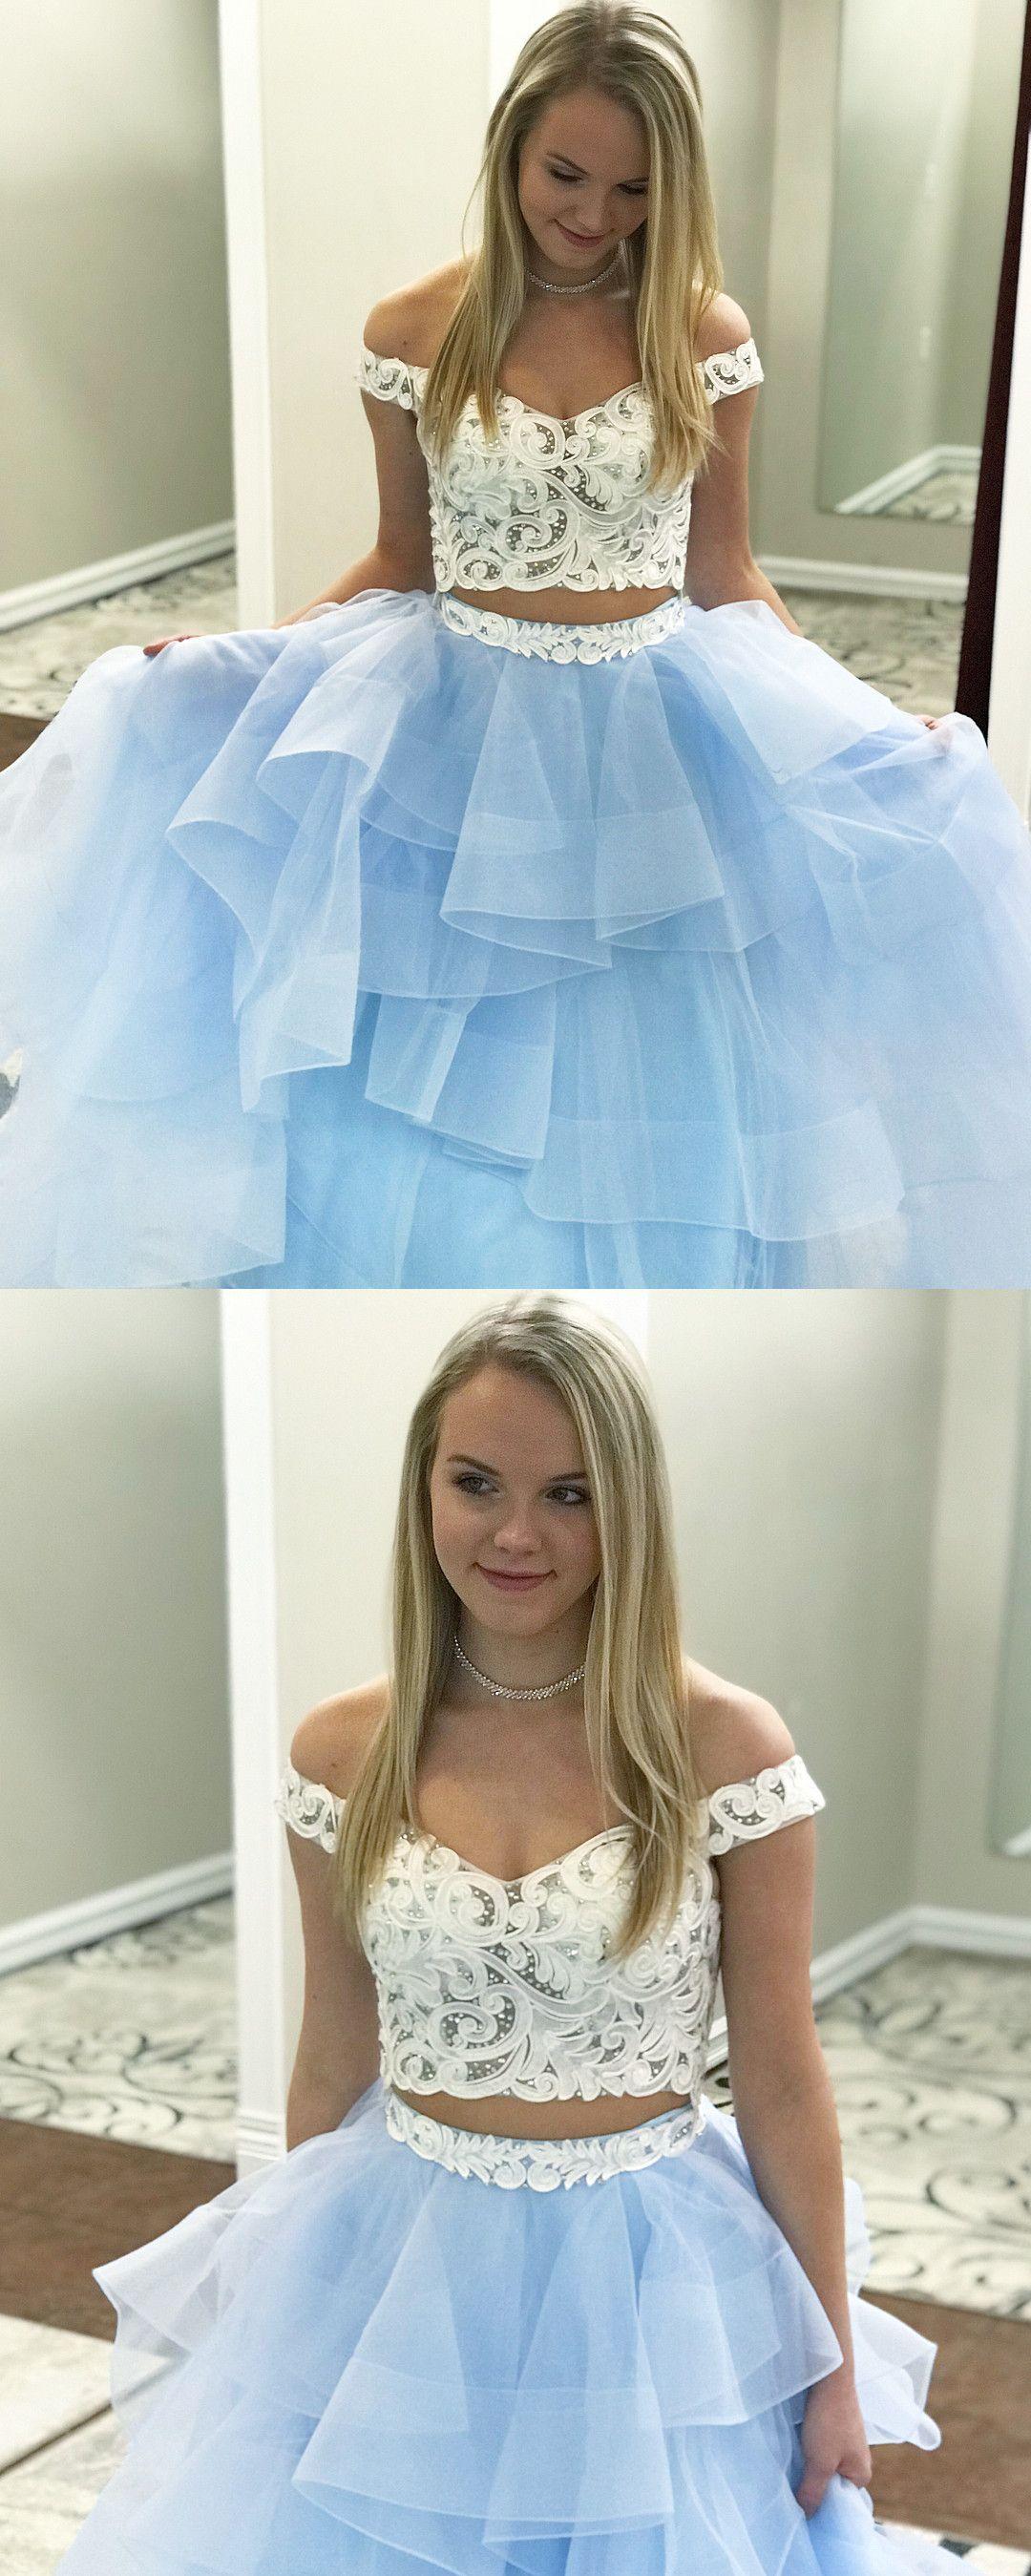 Princess two piece long prom dress white and sky blue prom dress